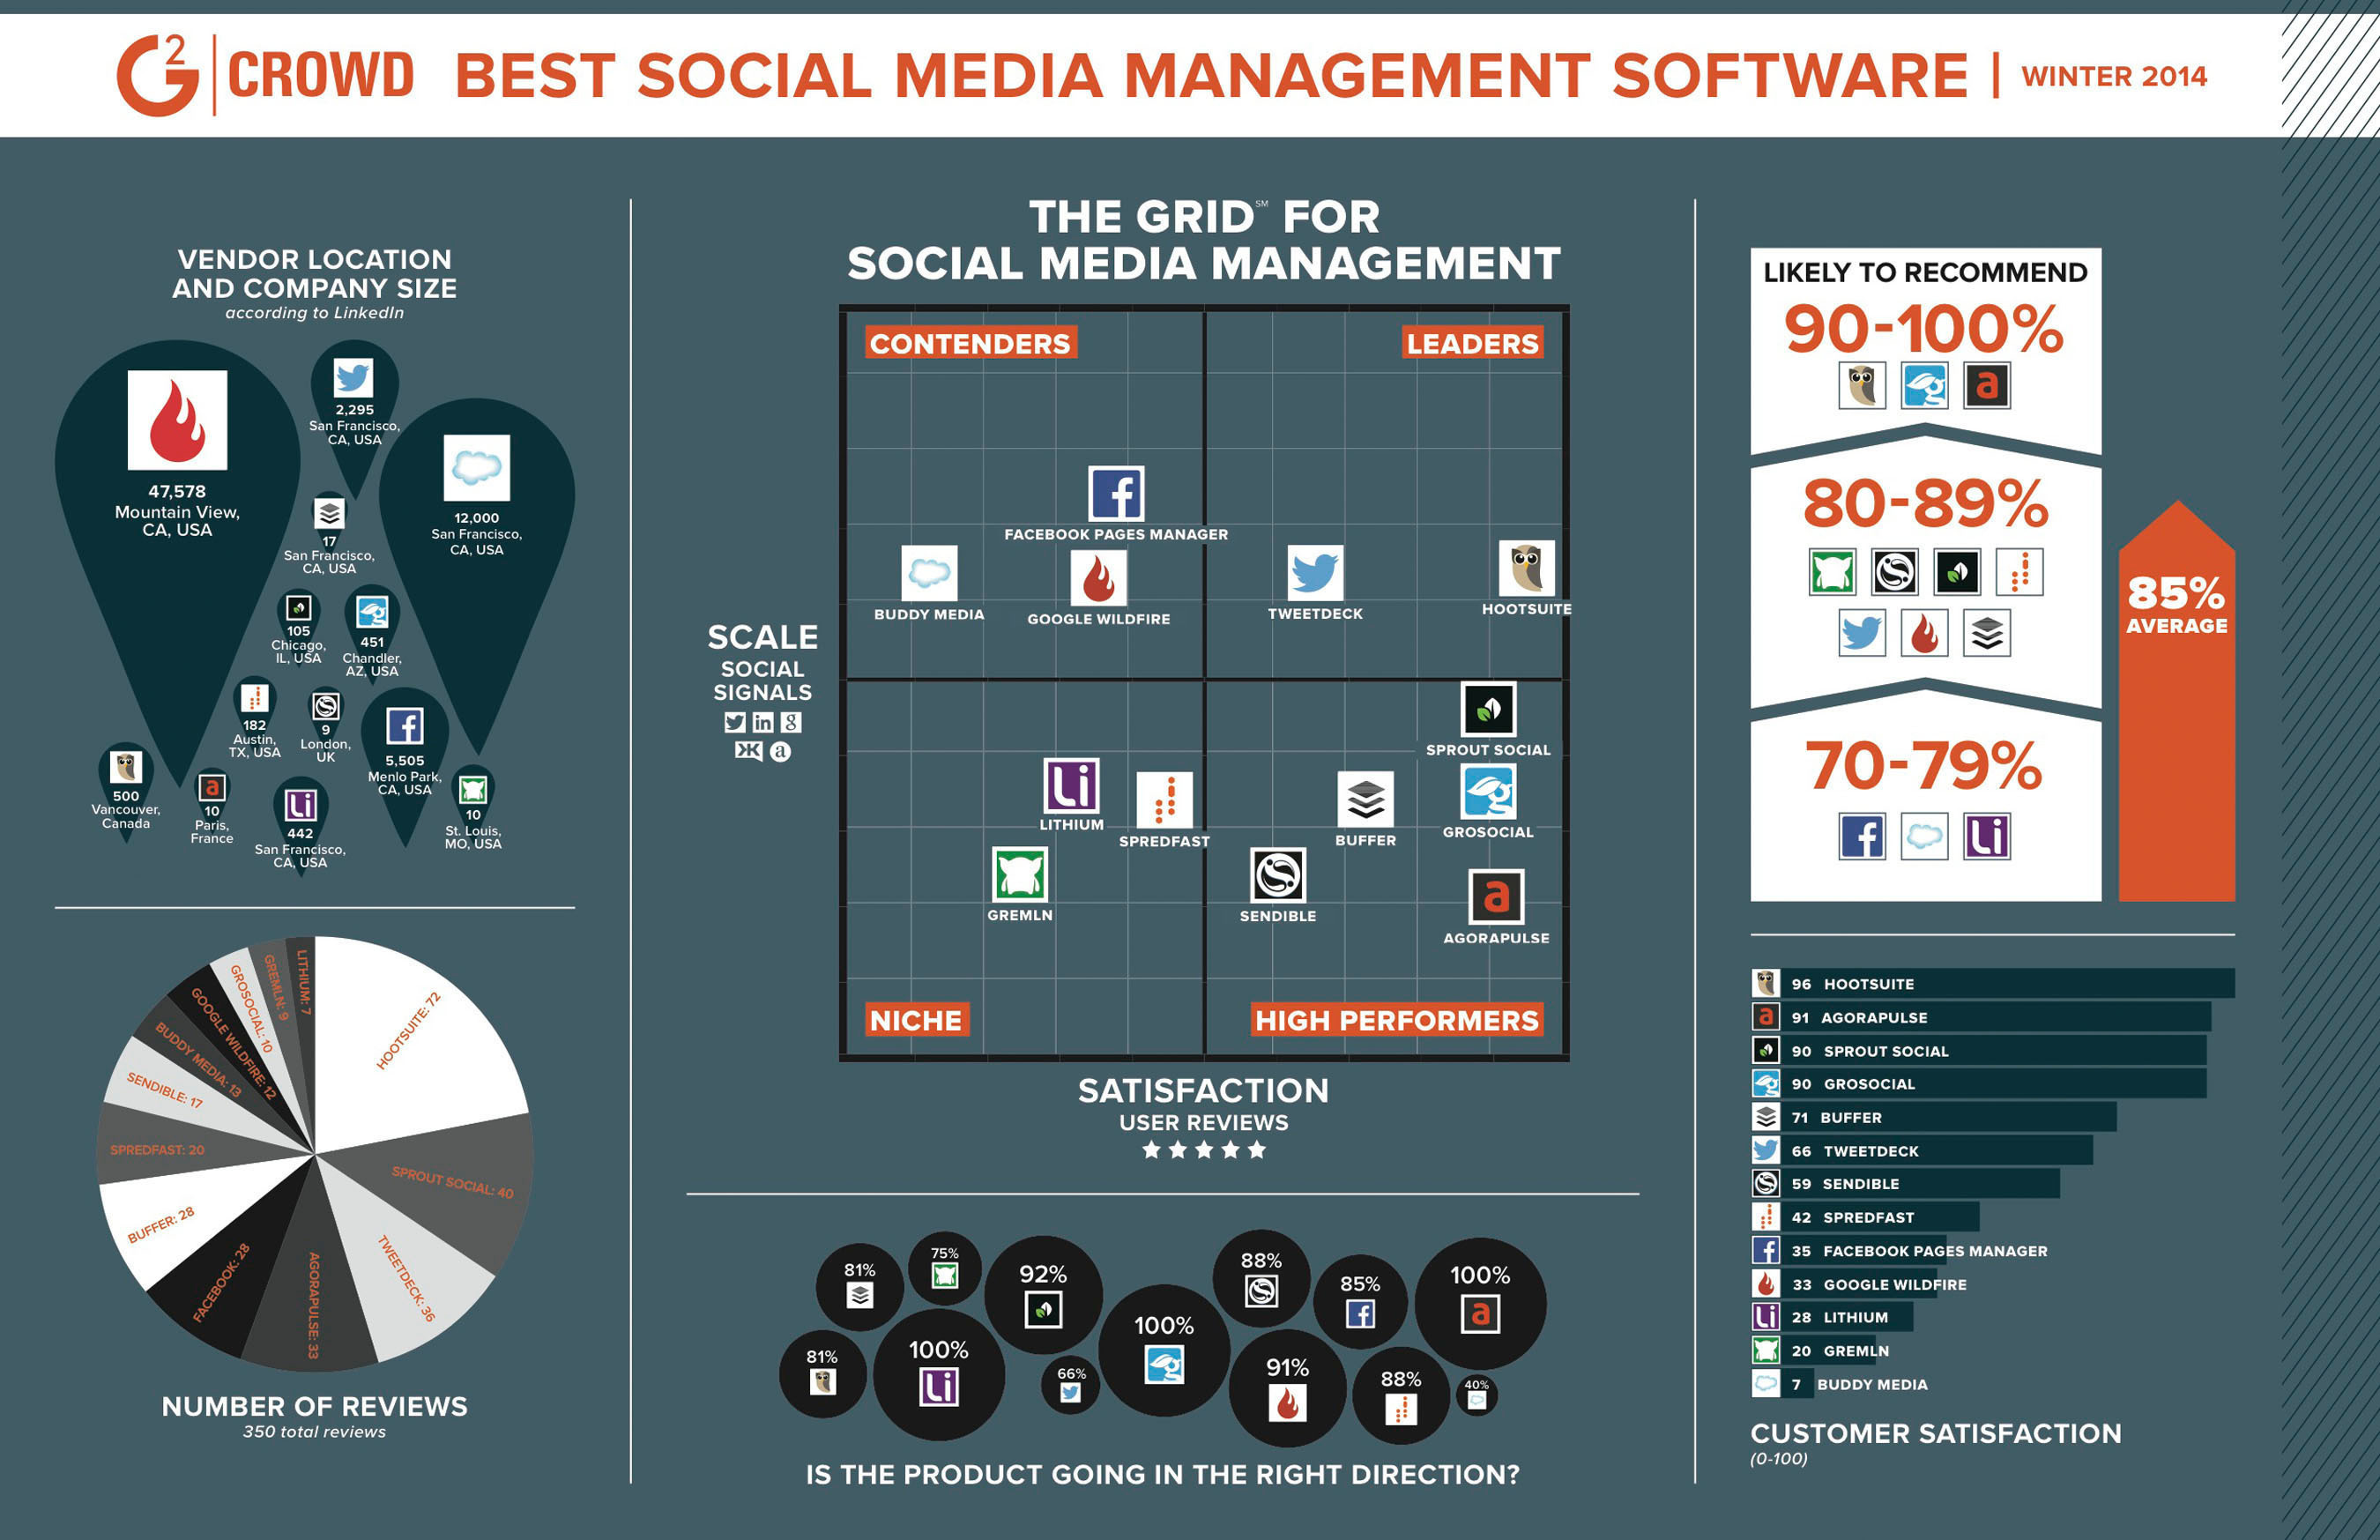 Best Social Media Management Software. (PRNewsFoto/G2 Crowd) (PRNewsFoto/G2 CROWD)